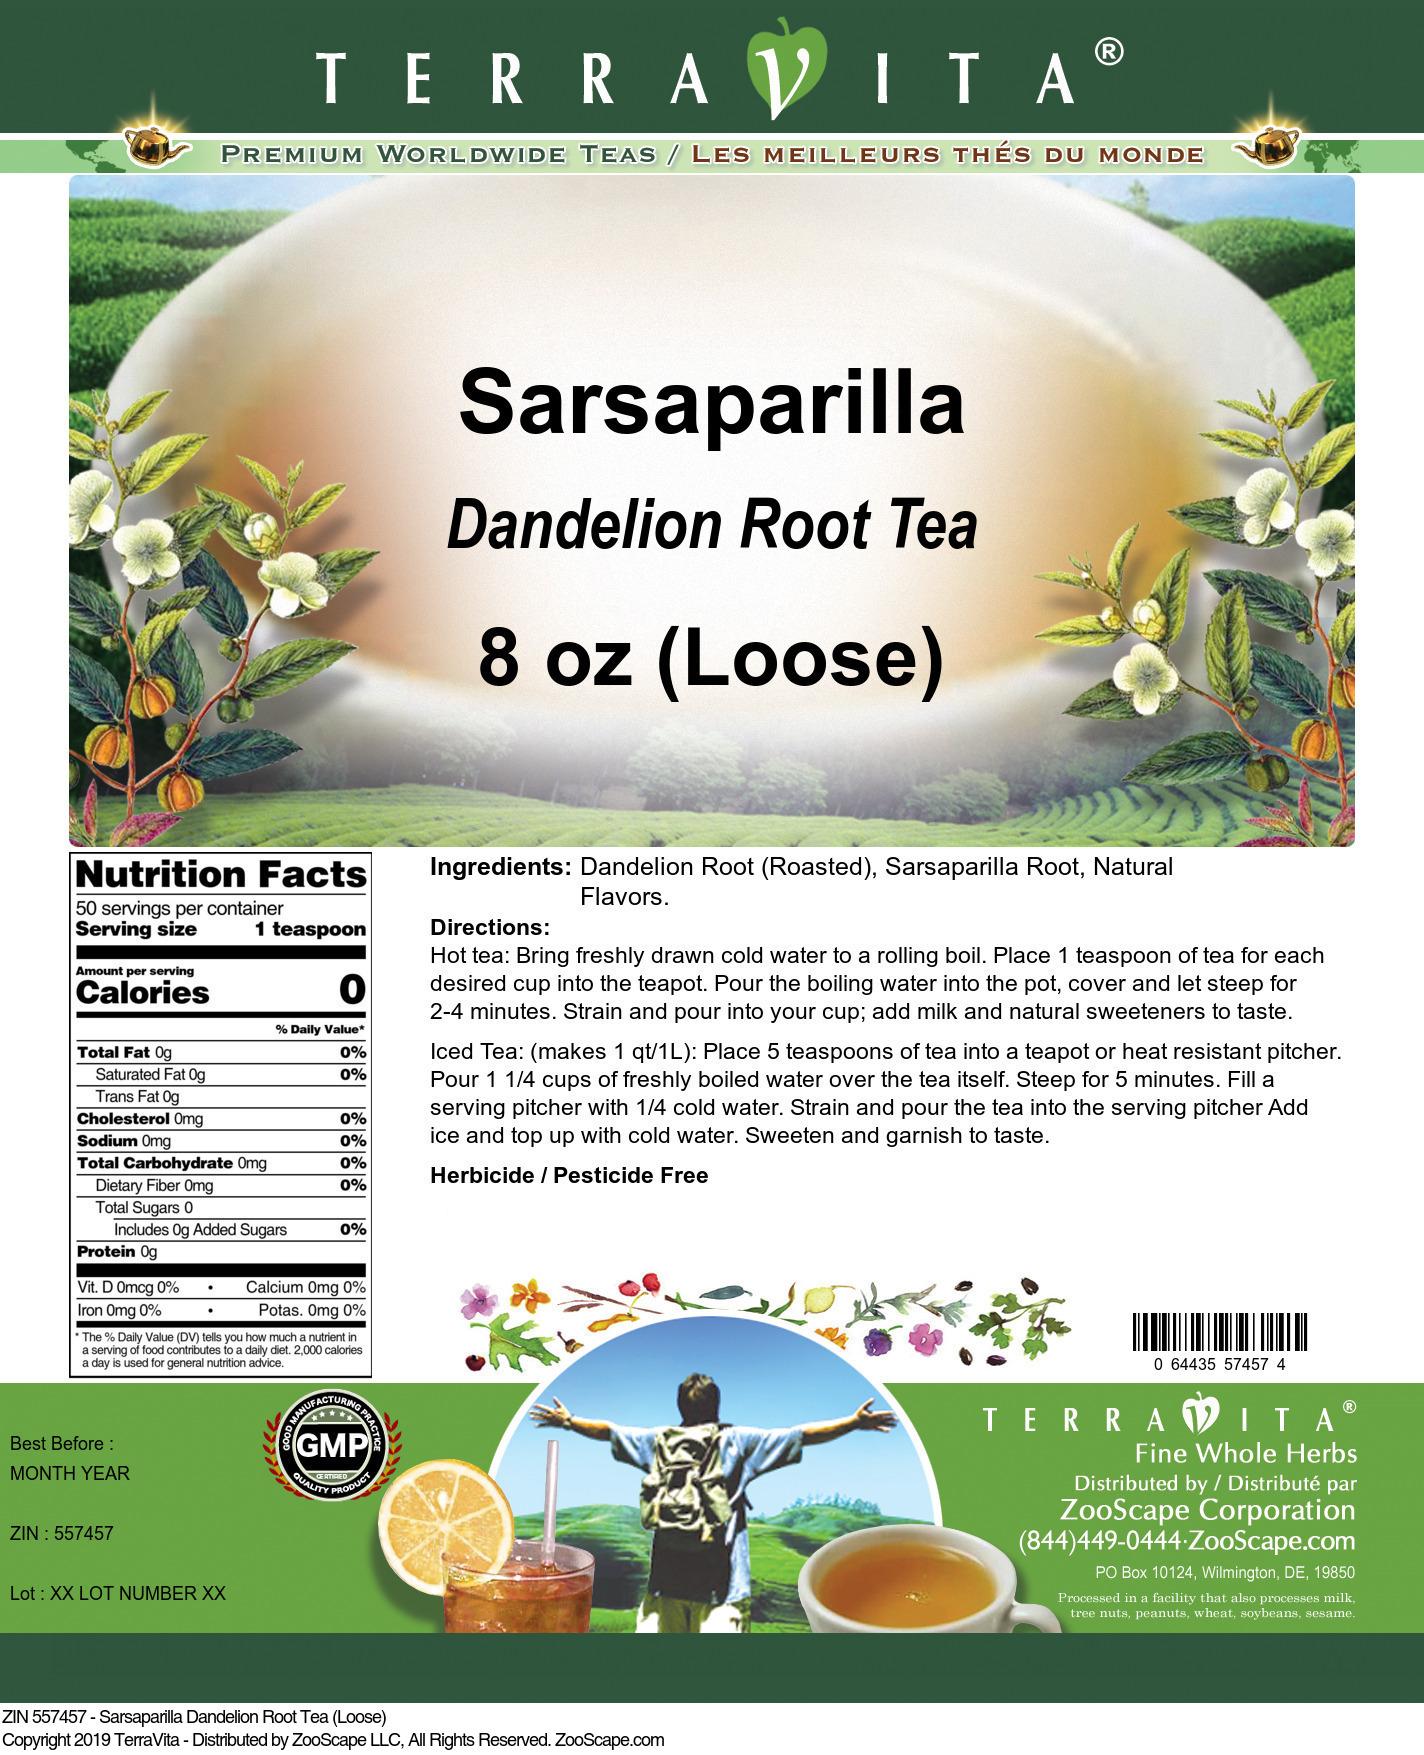 Sarsaparilla Dandelion Root Tea (Loose)